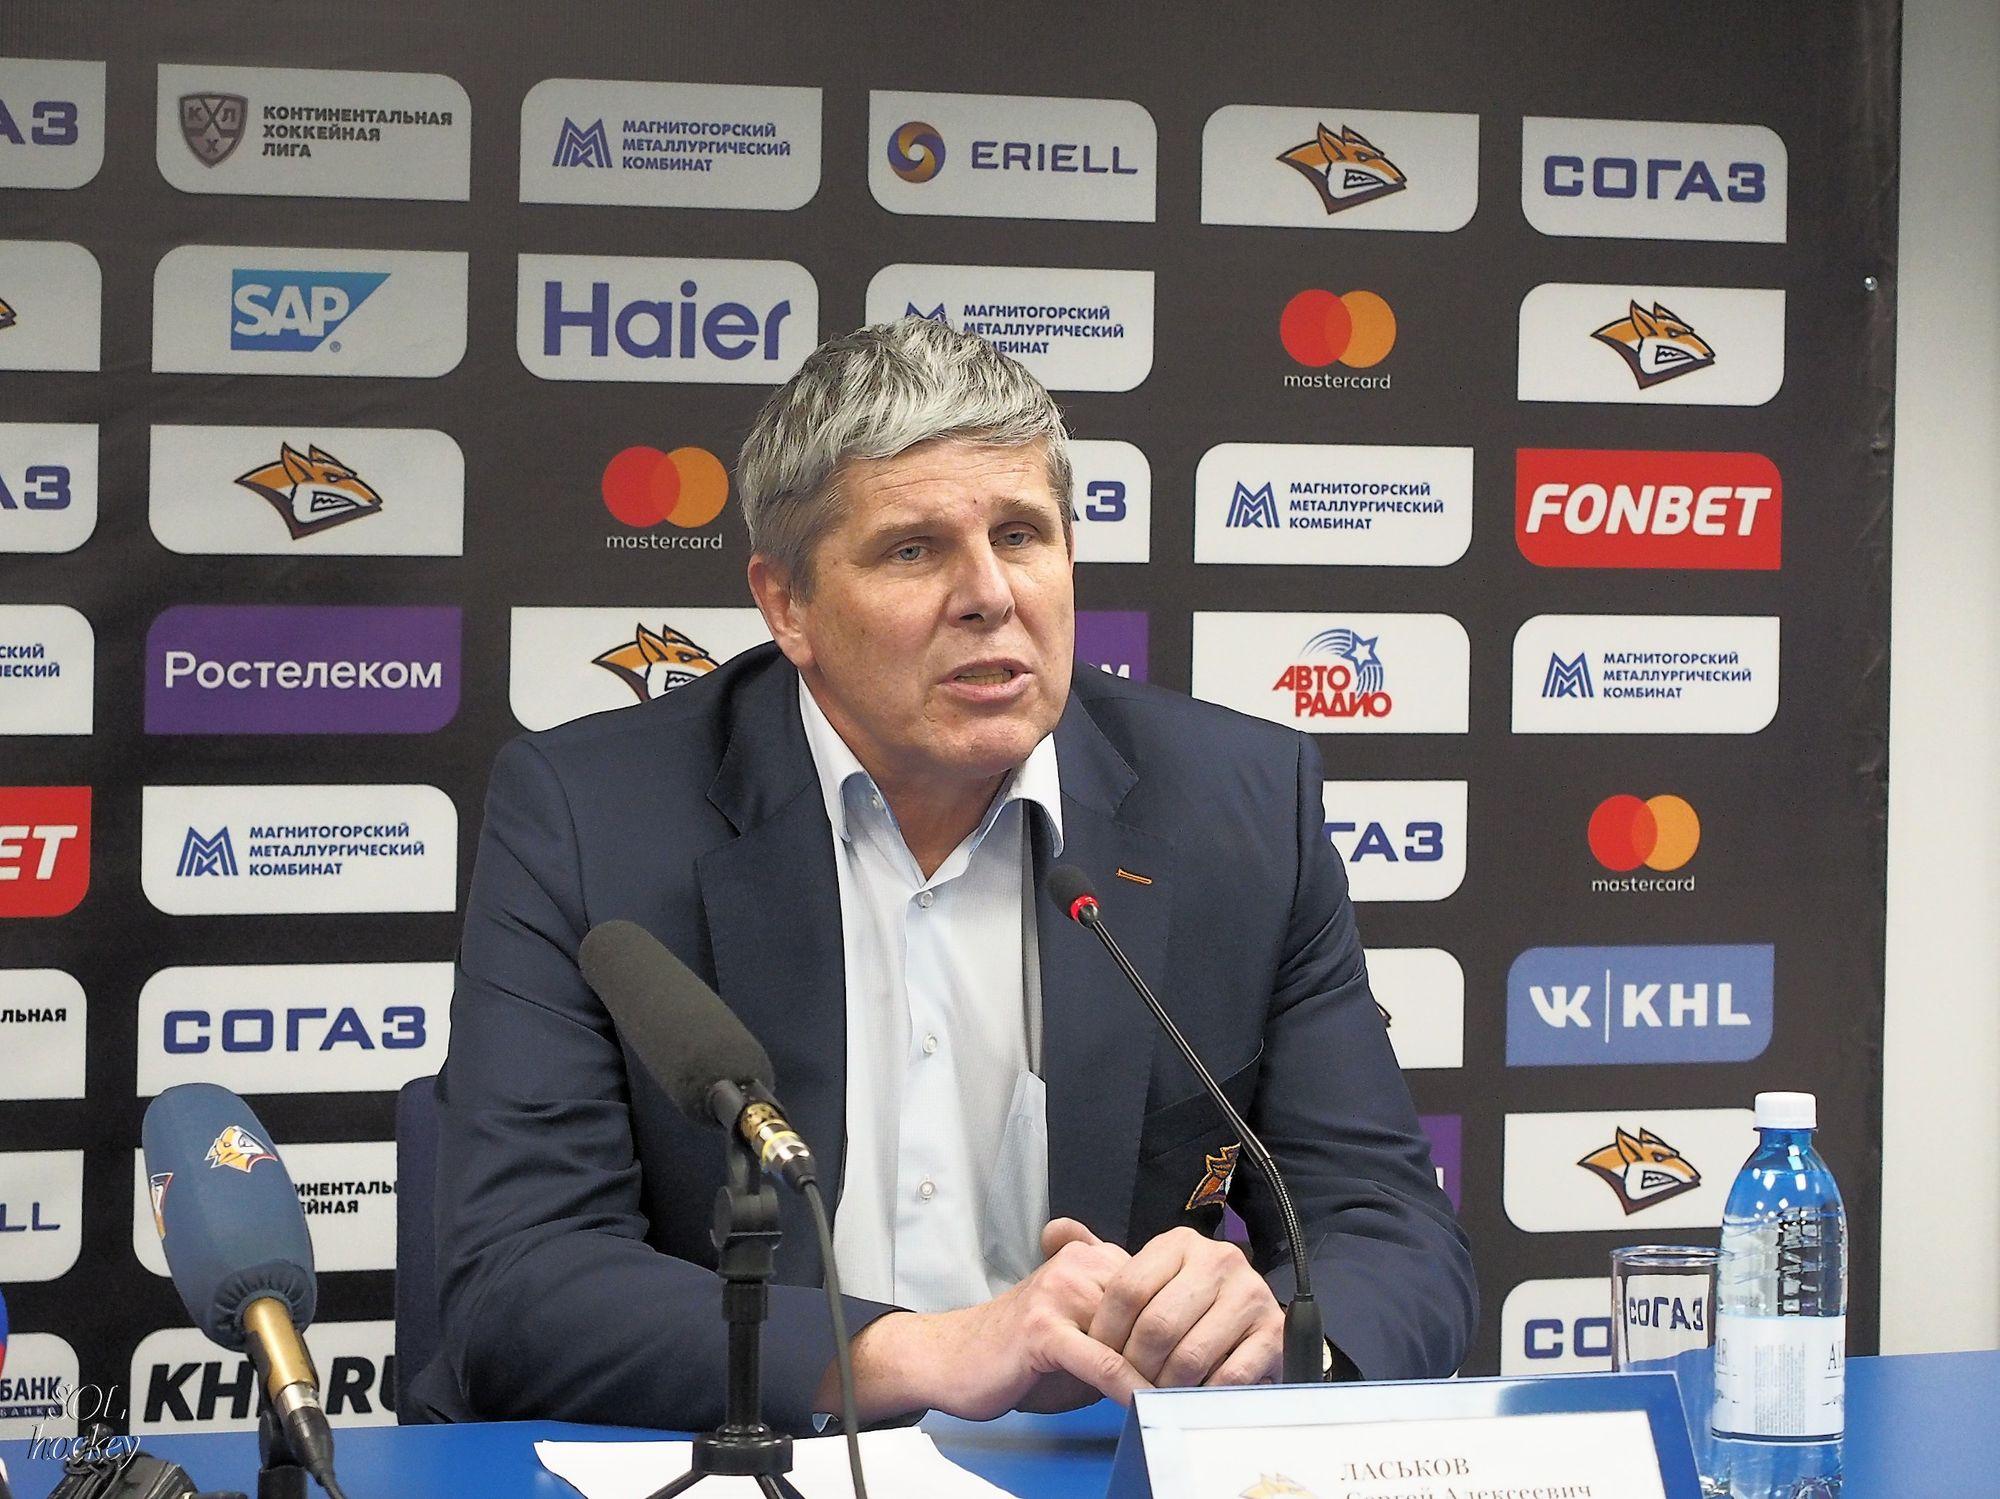 https://solhockey.ru/content/images/2020/03/P3180005.JPG